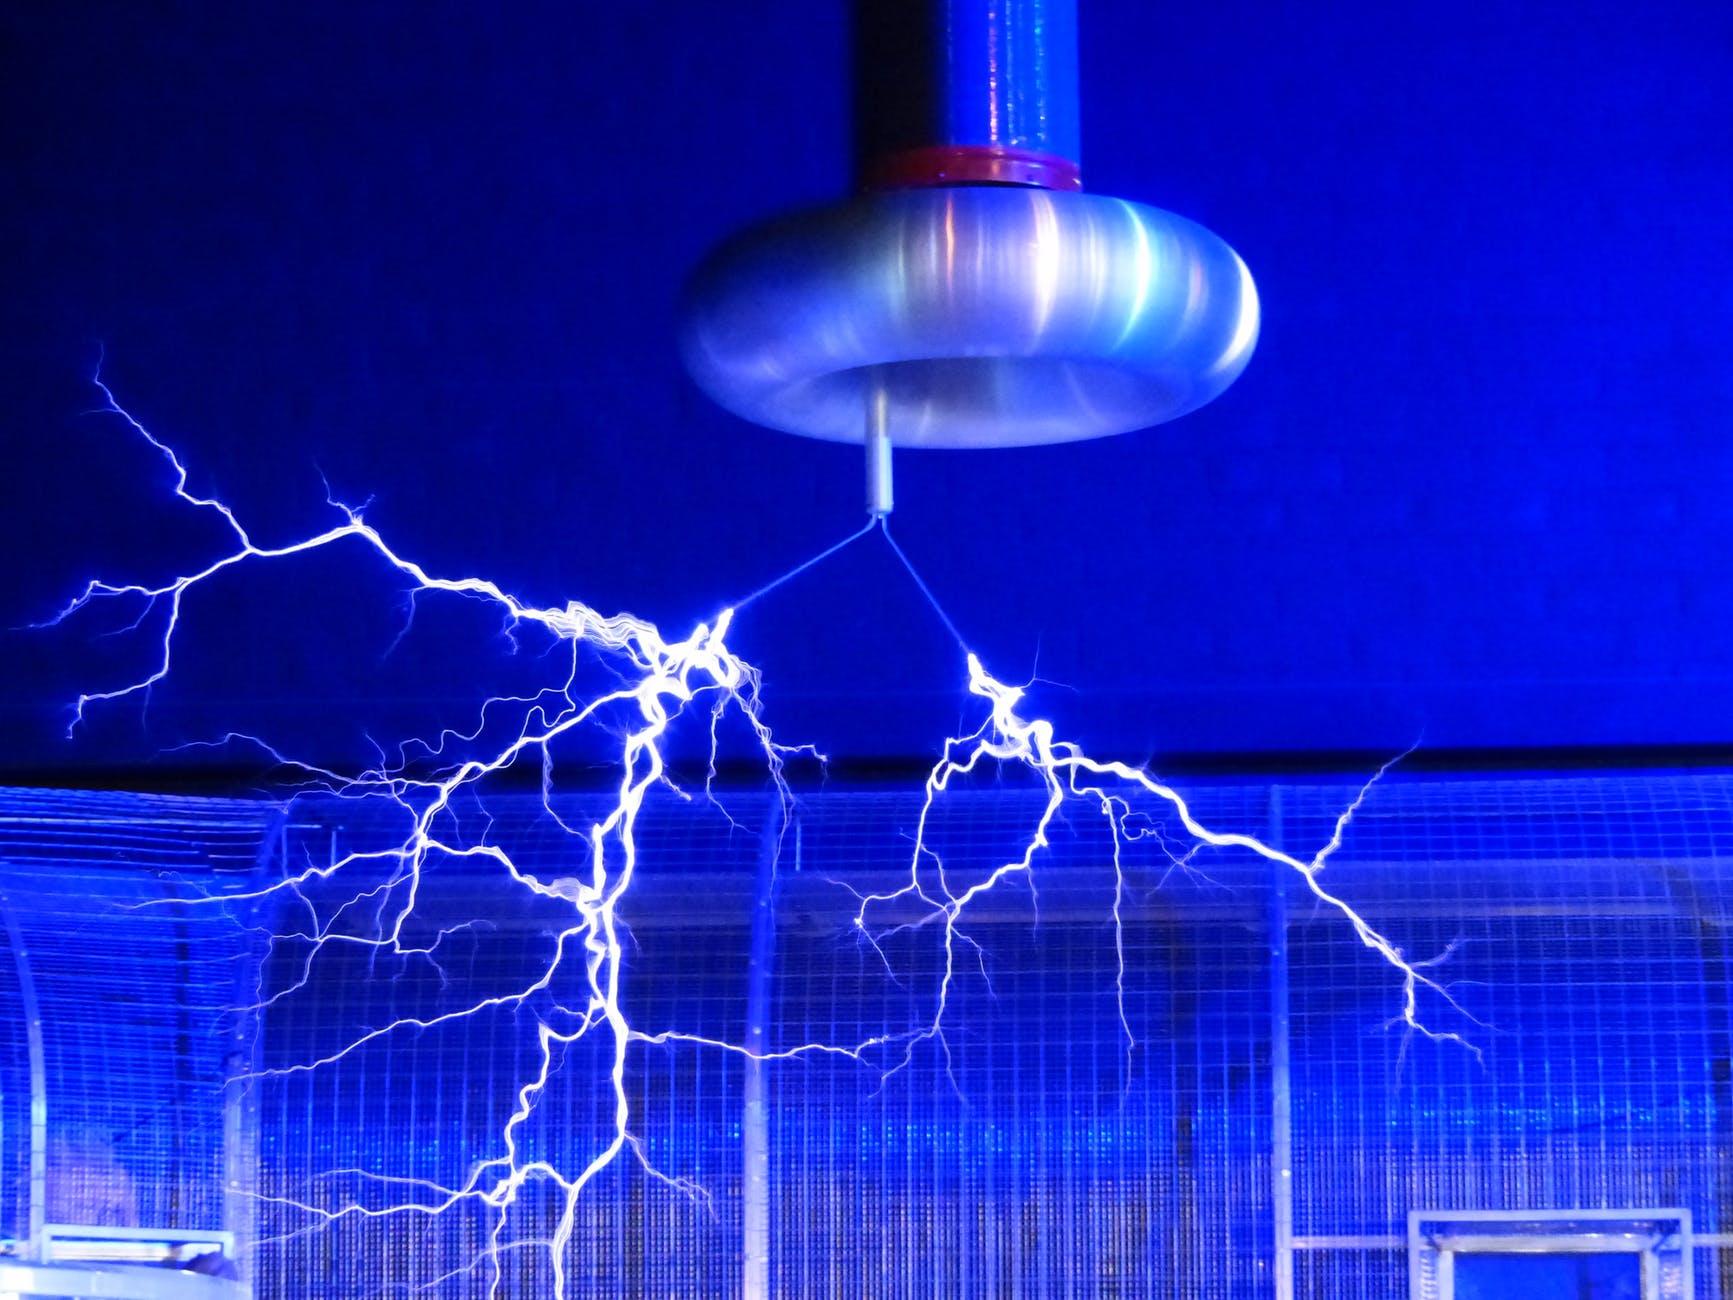 flash-tesla-coil-experiment-faradayscher-cage-68173.jpeg